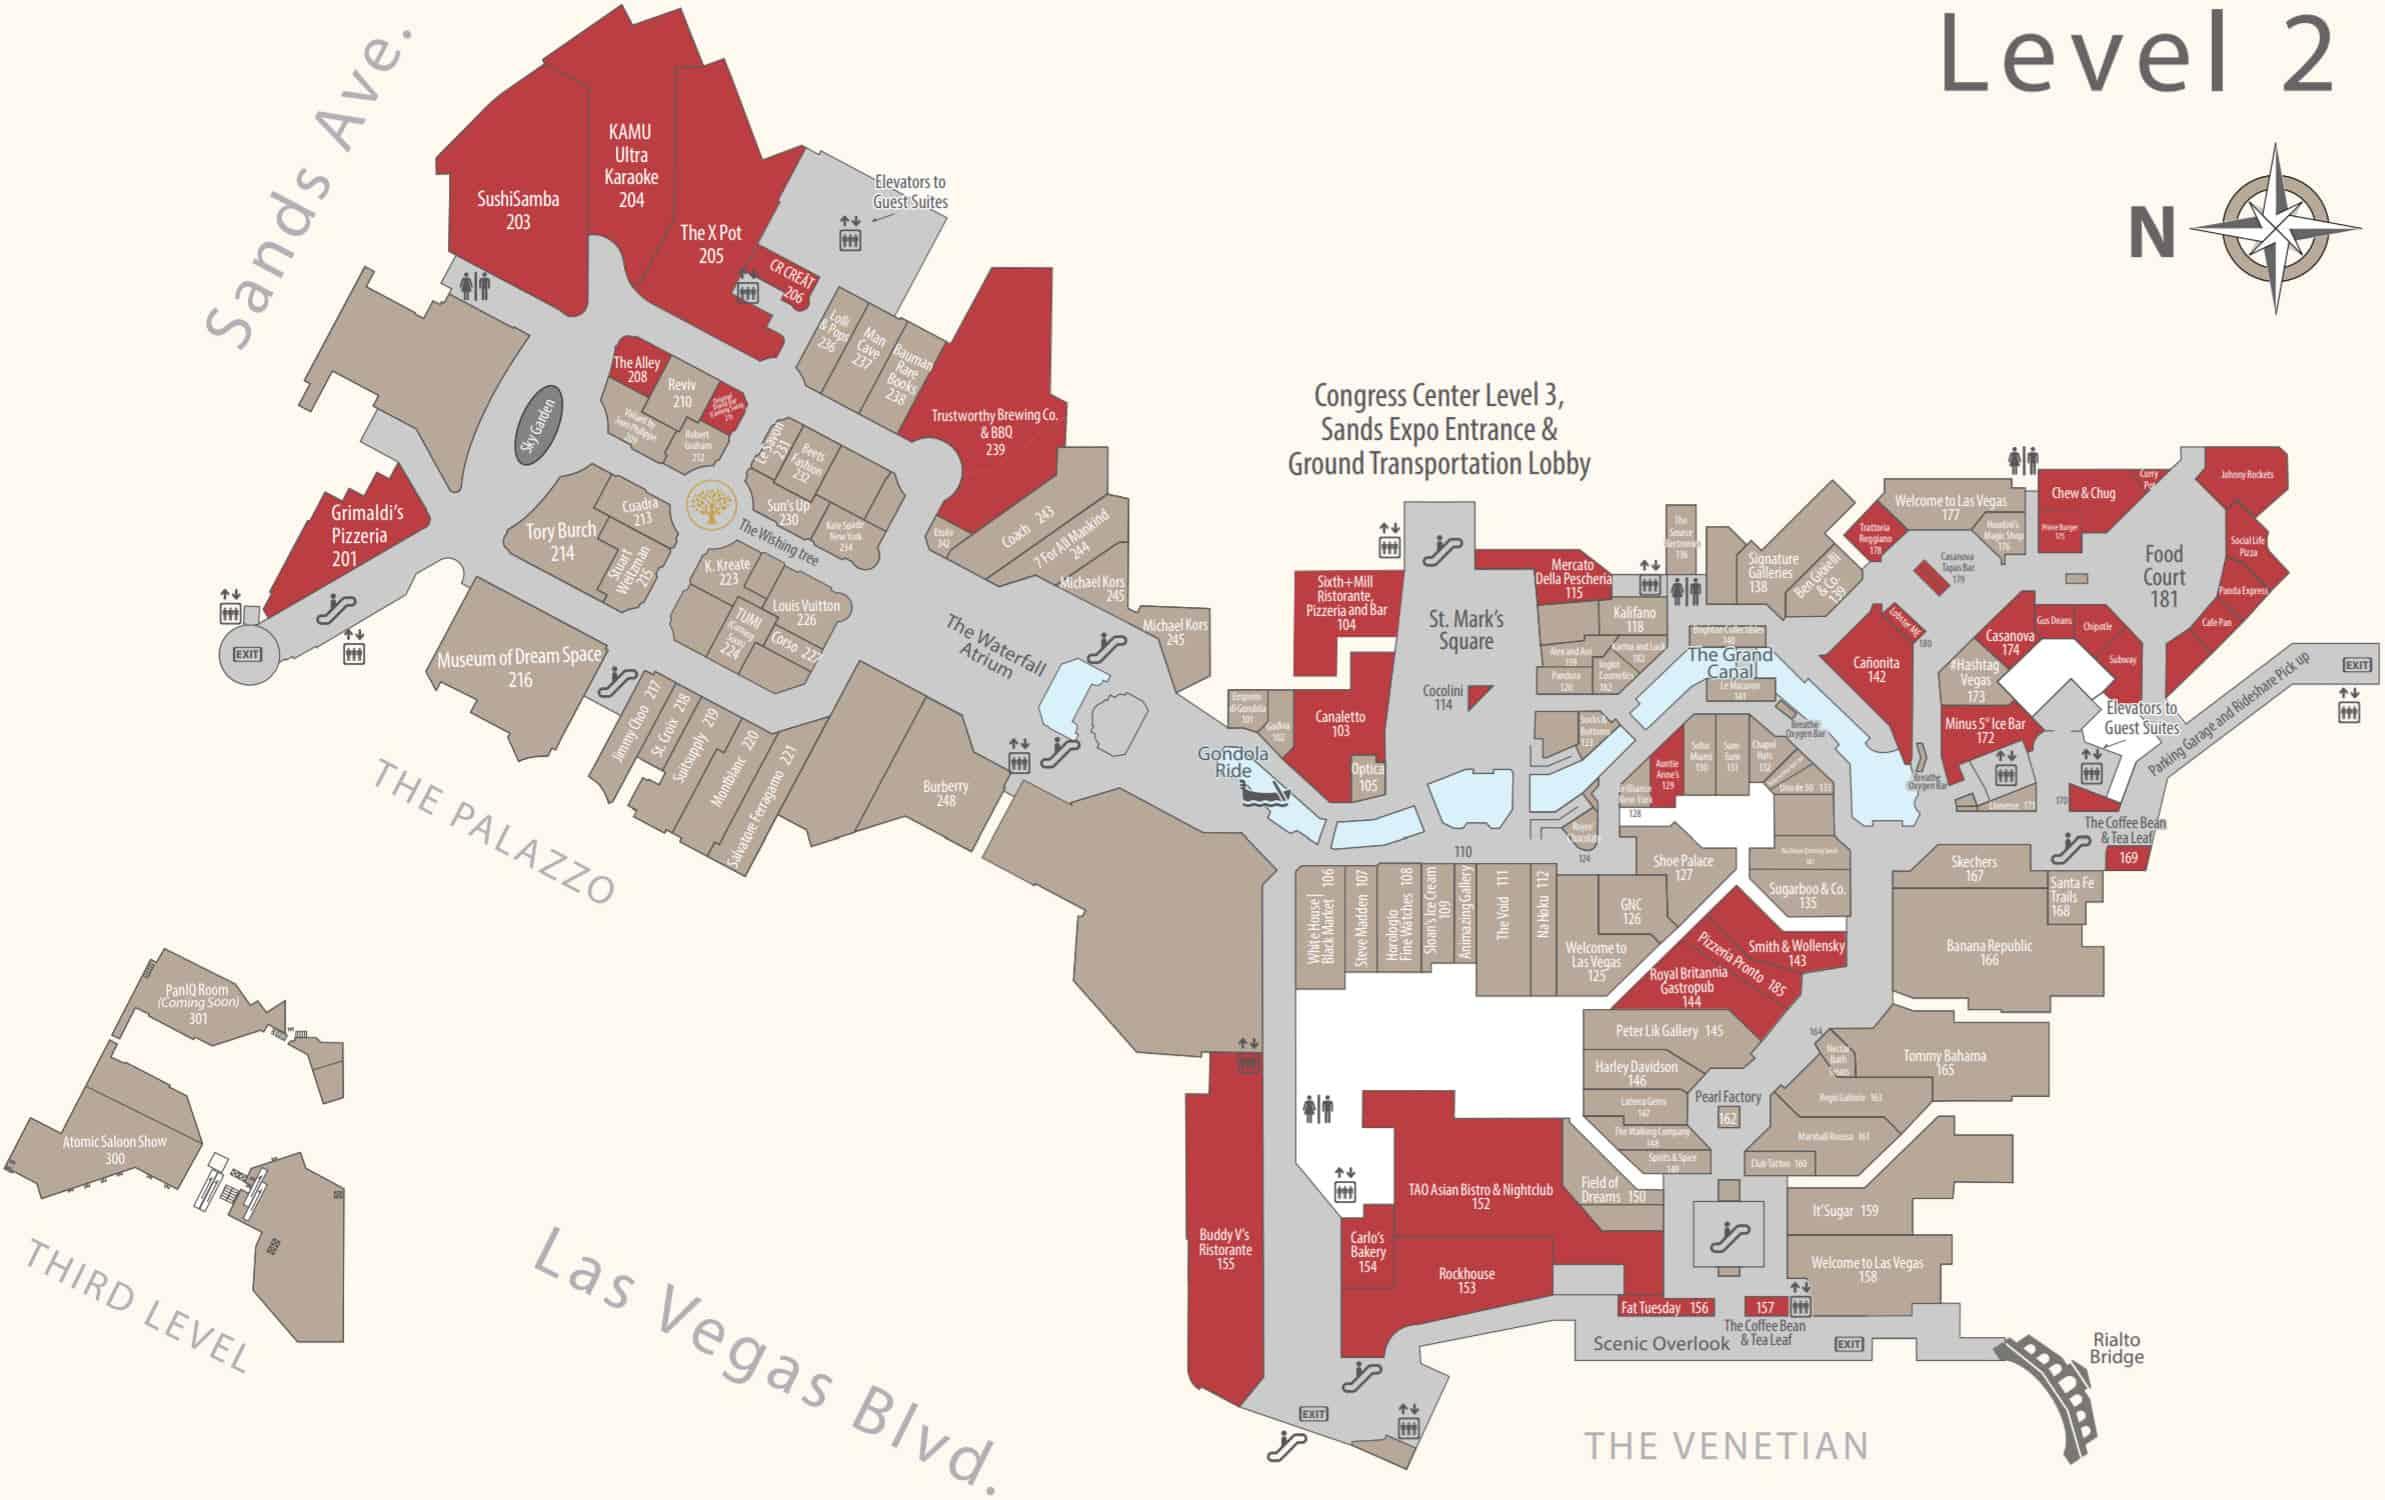 Venetian hotel map level 2